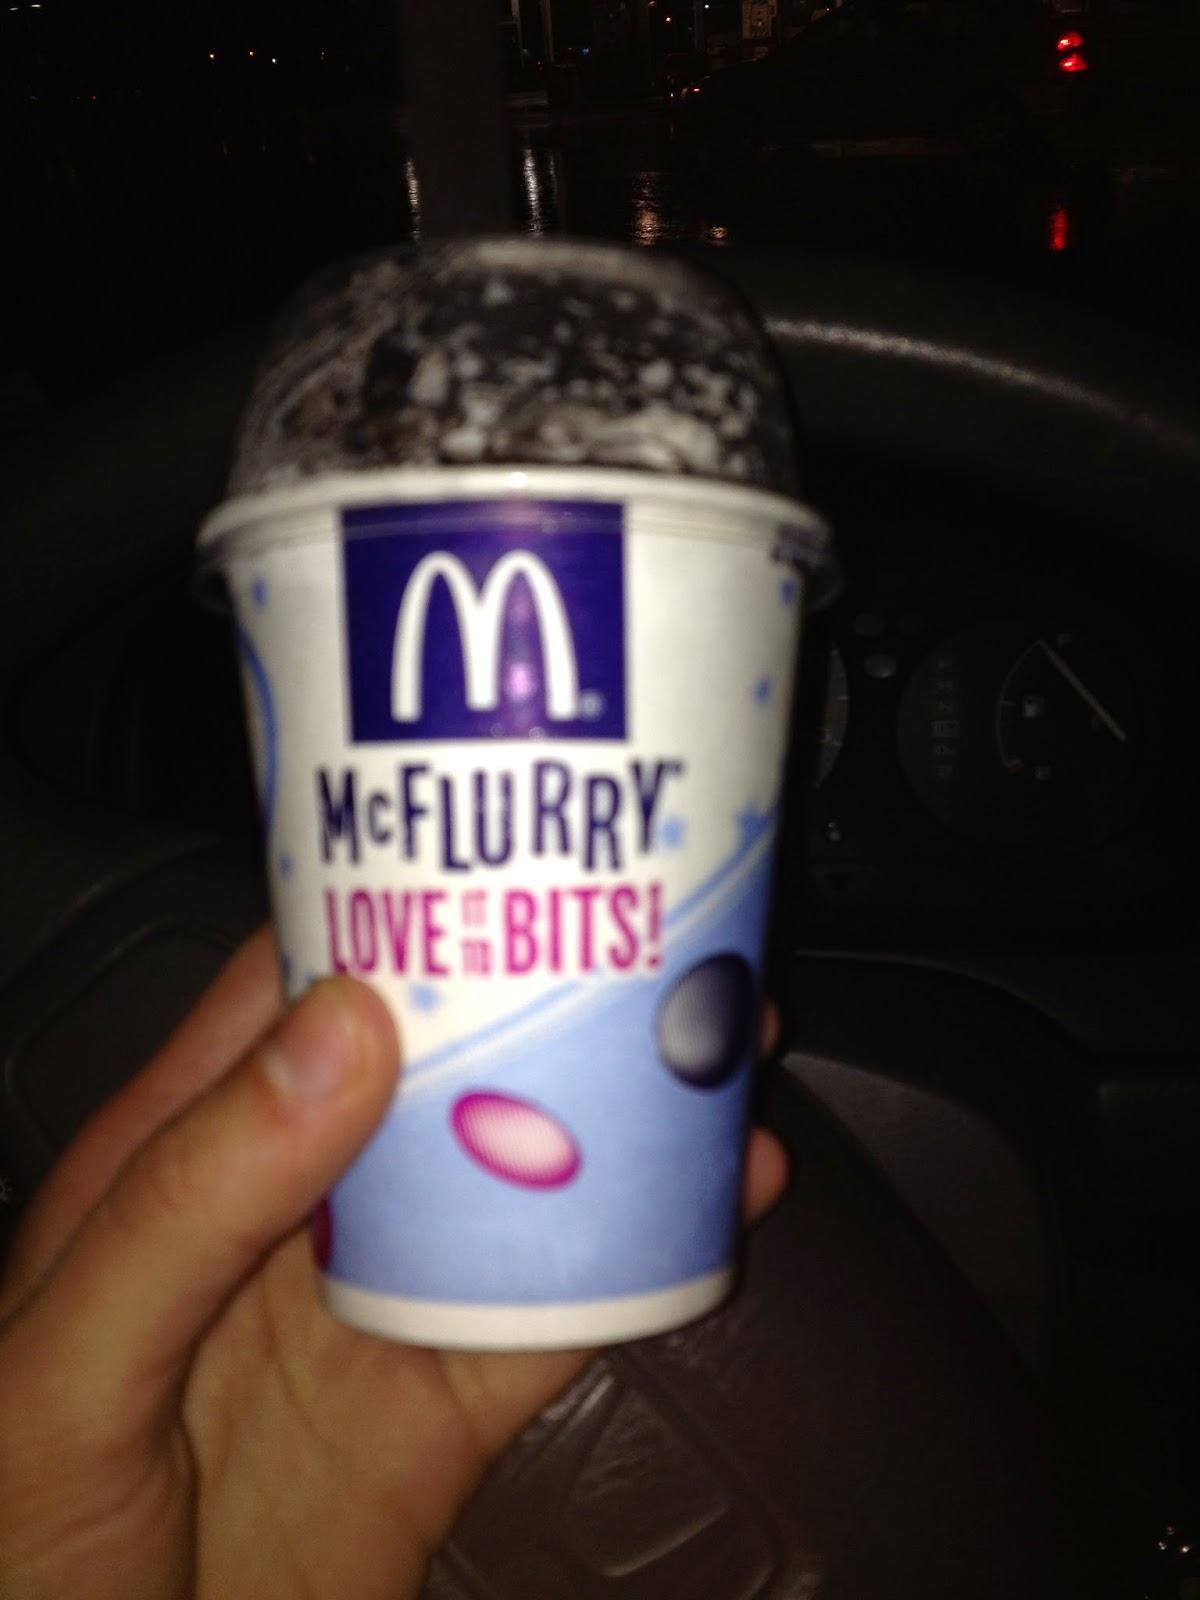 The Big Muddy Ice Cream Blog: McDonald's Oreo McFlurry